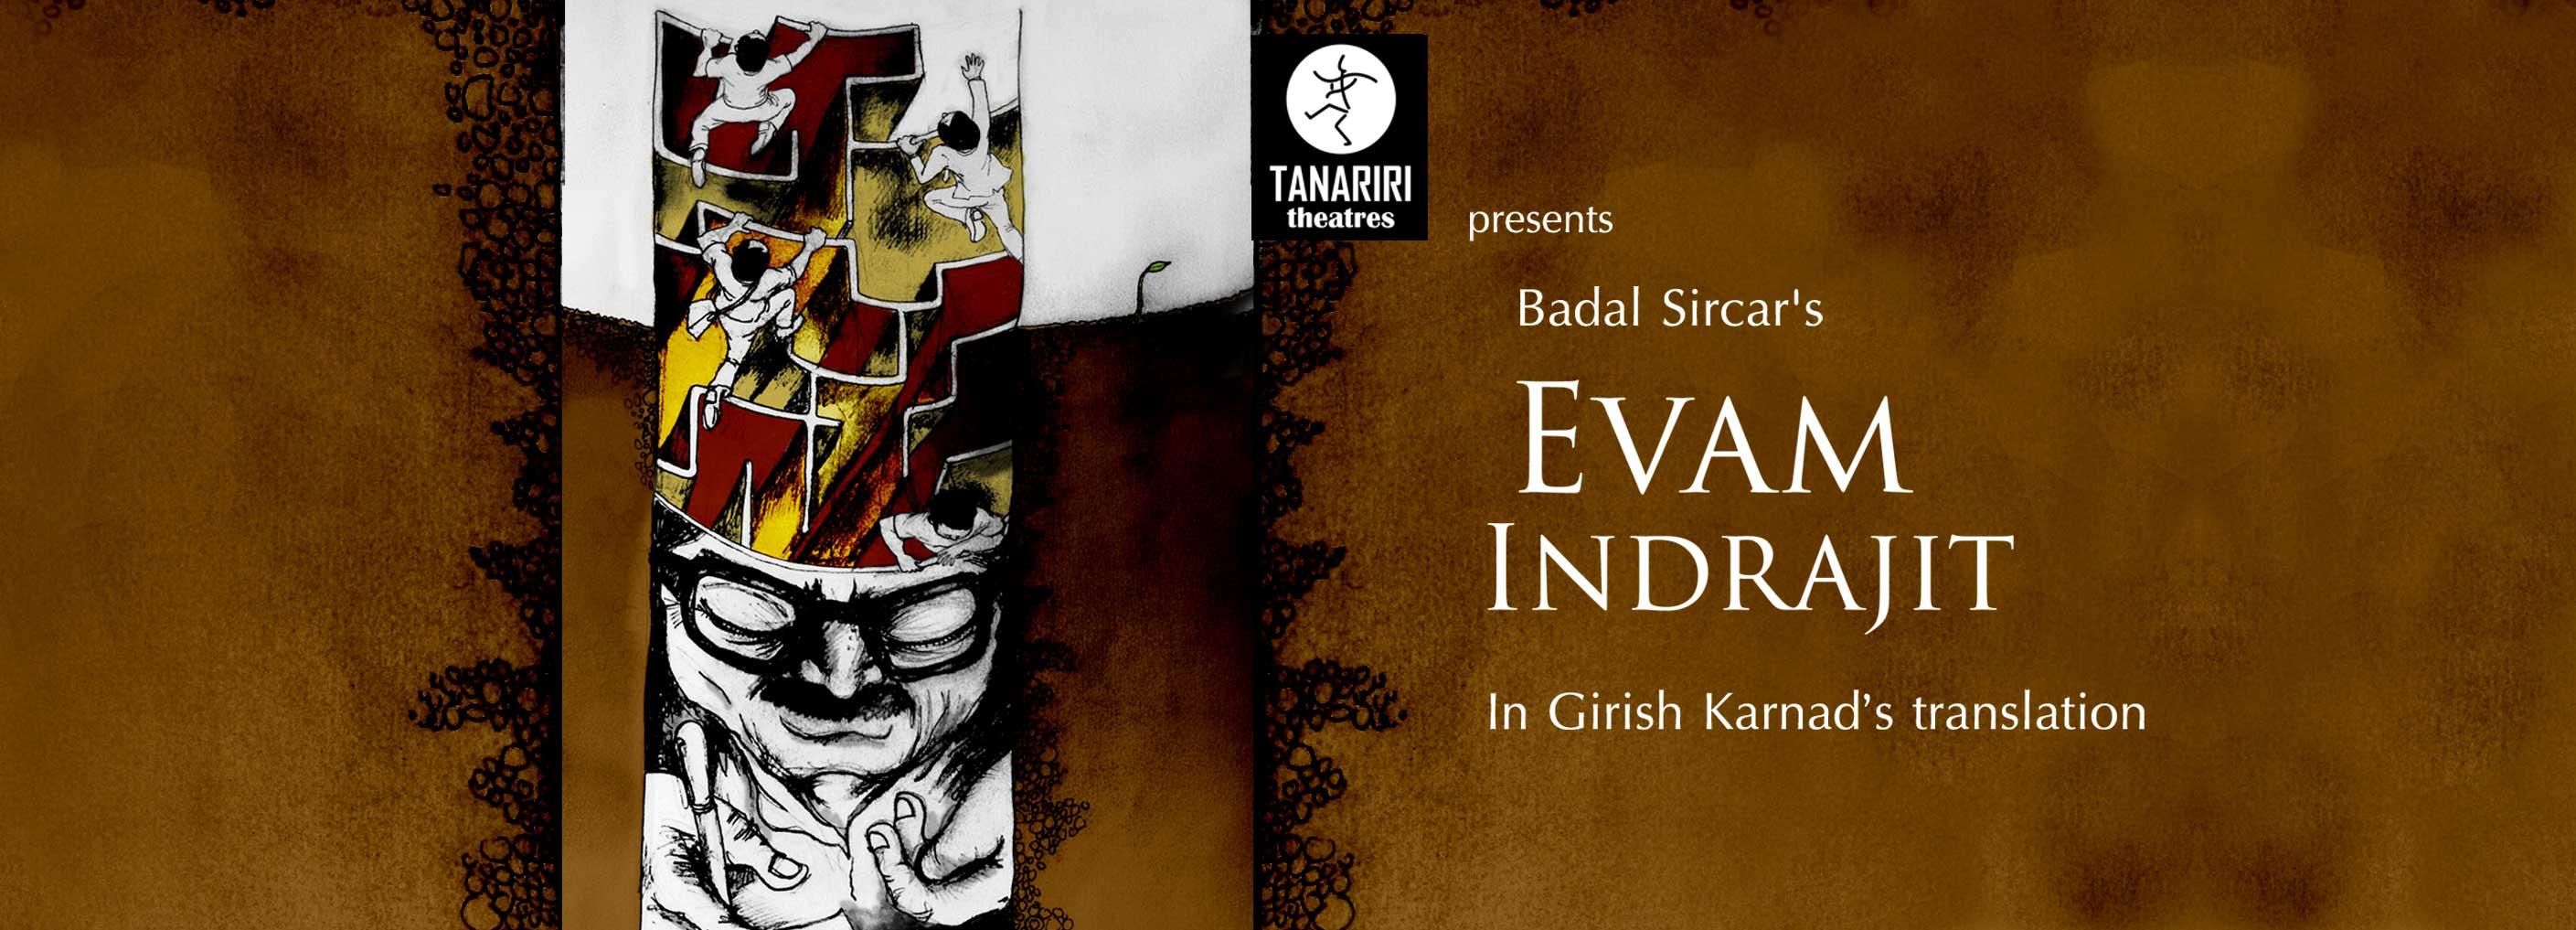 Tanariri Theatres presents Evam Indrajit